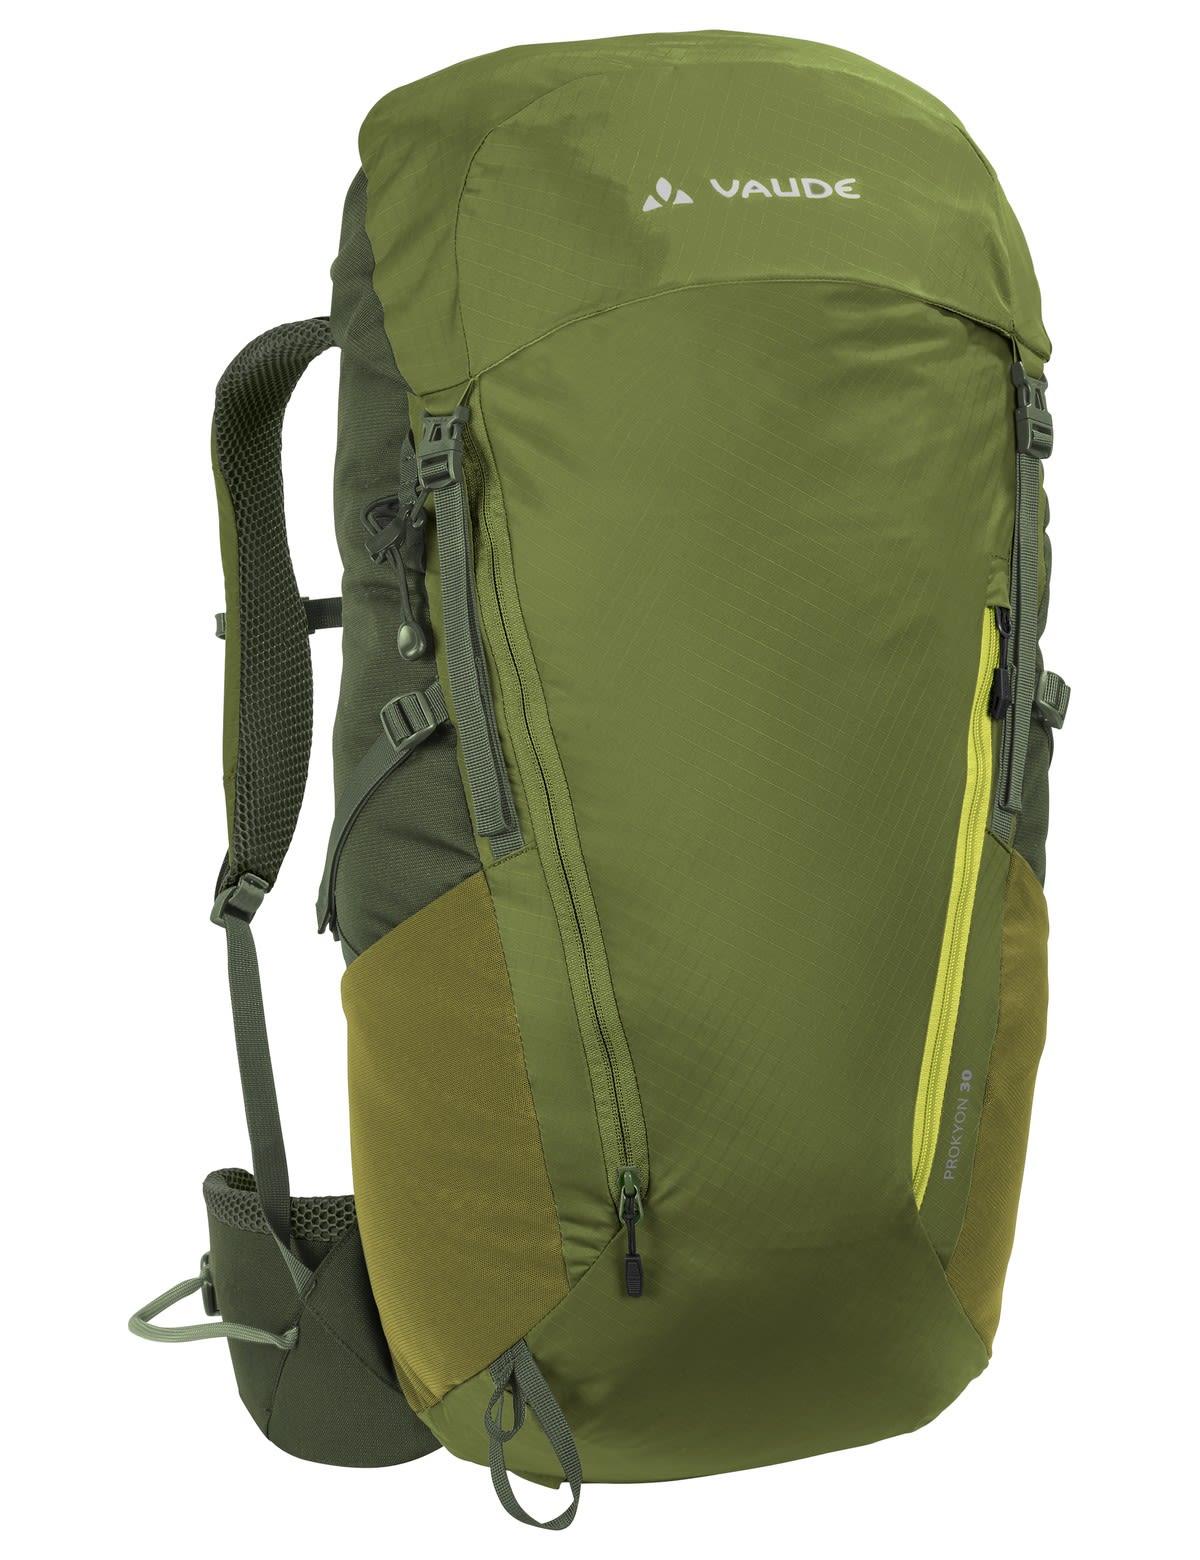 Vaude Prokyon 30 Grün, Alpin-& Trekkingrucksack, 30l